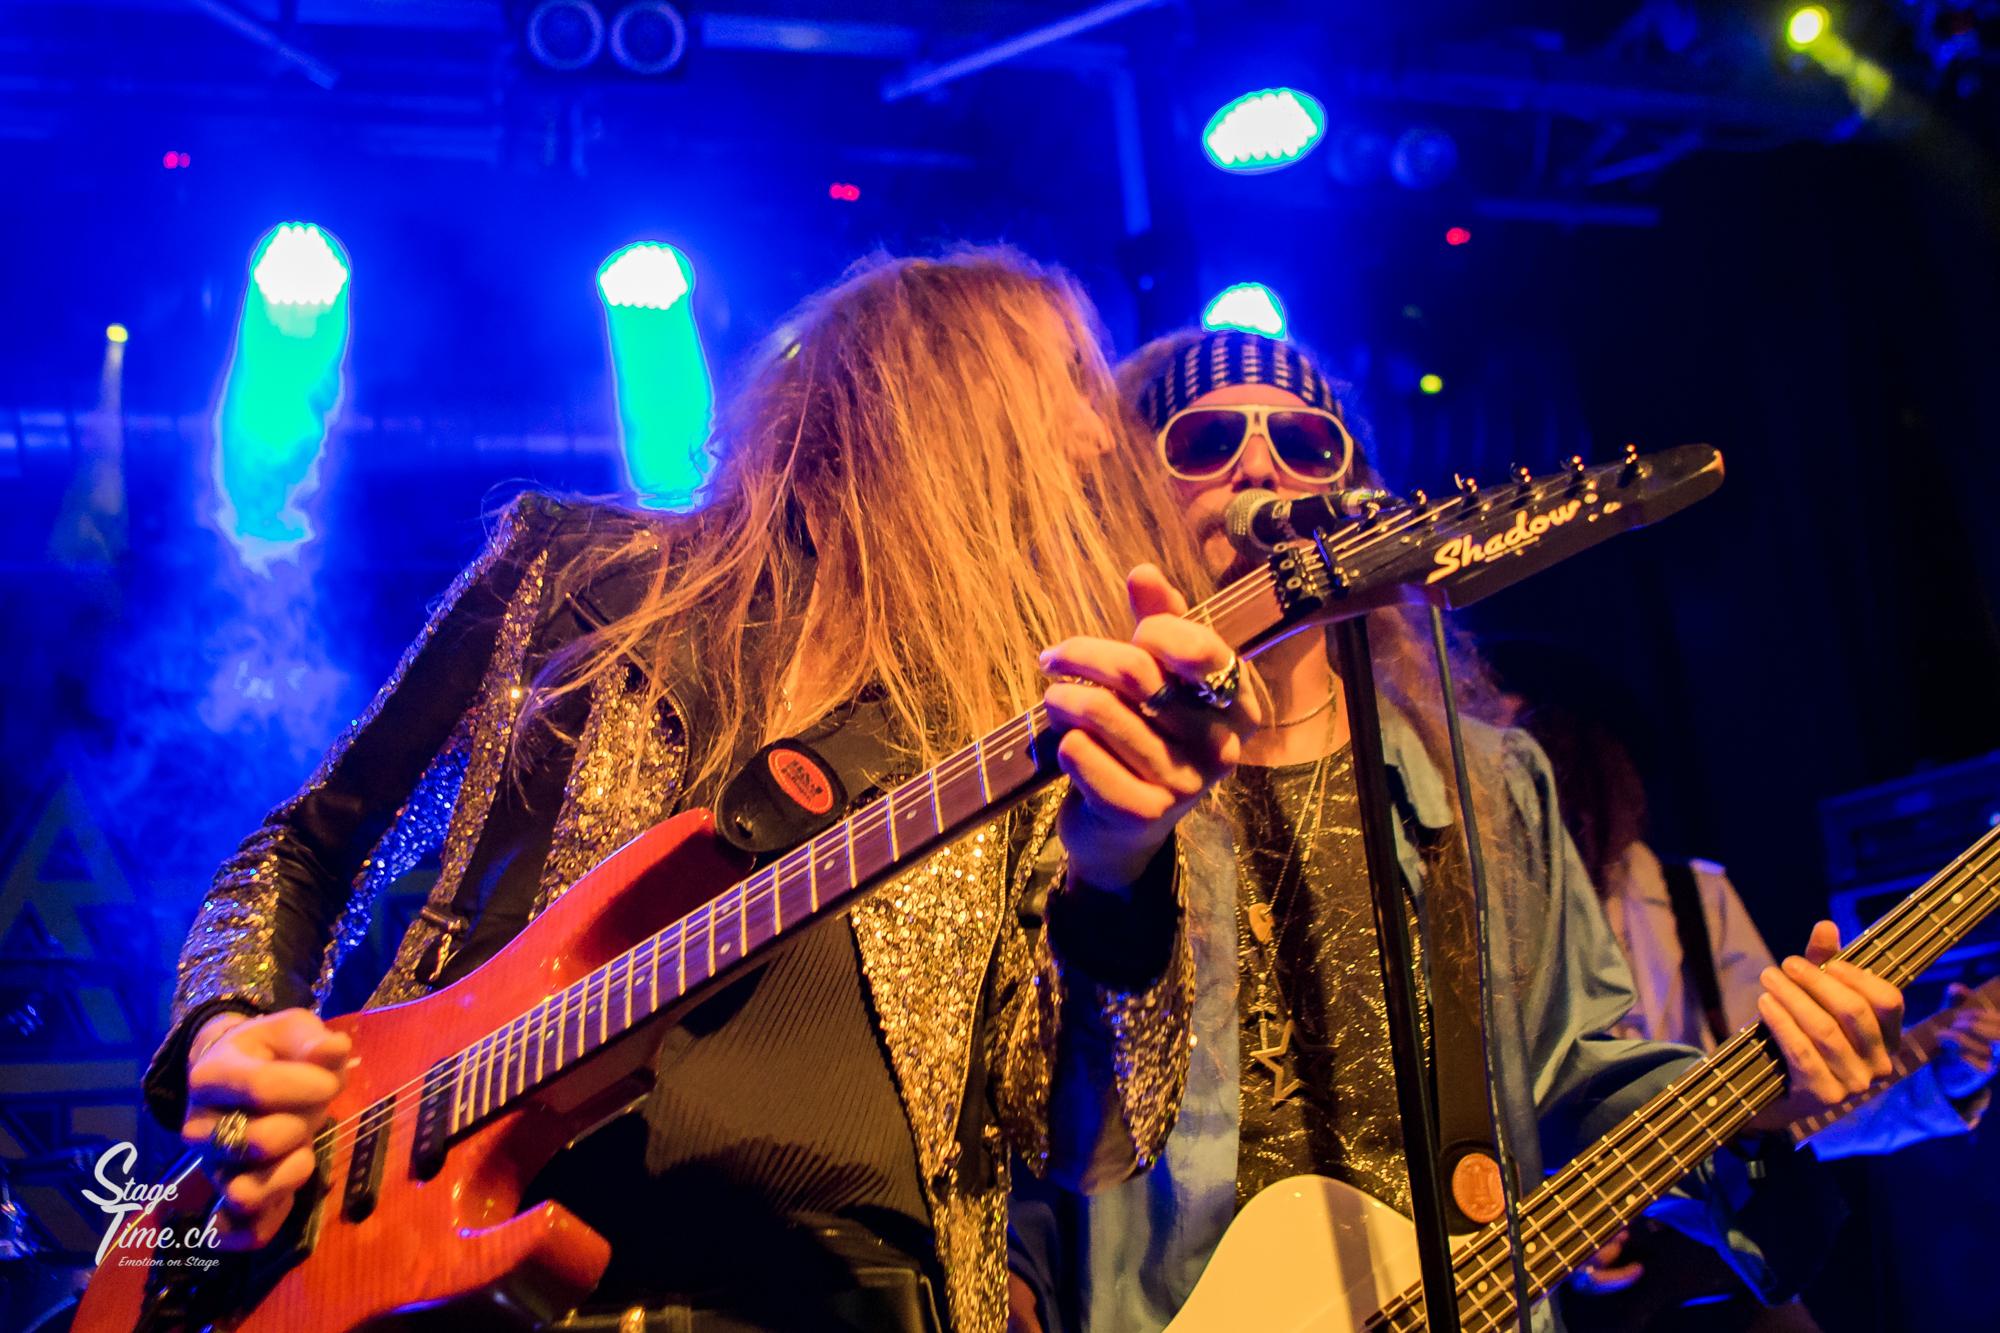 Rusted_Guns___1st_Swiss_Glam_Rock_Fest-3